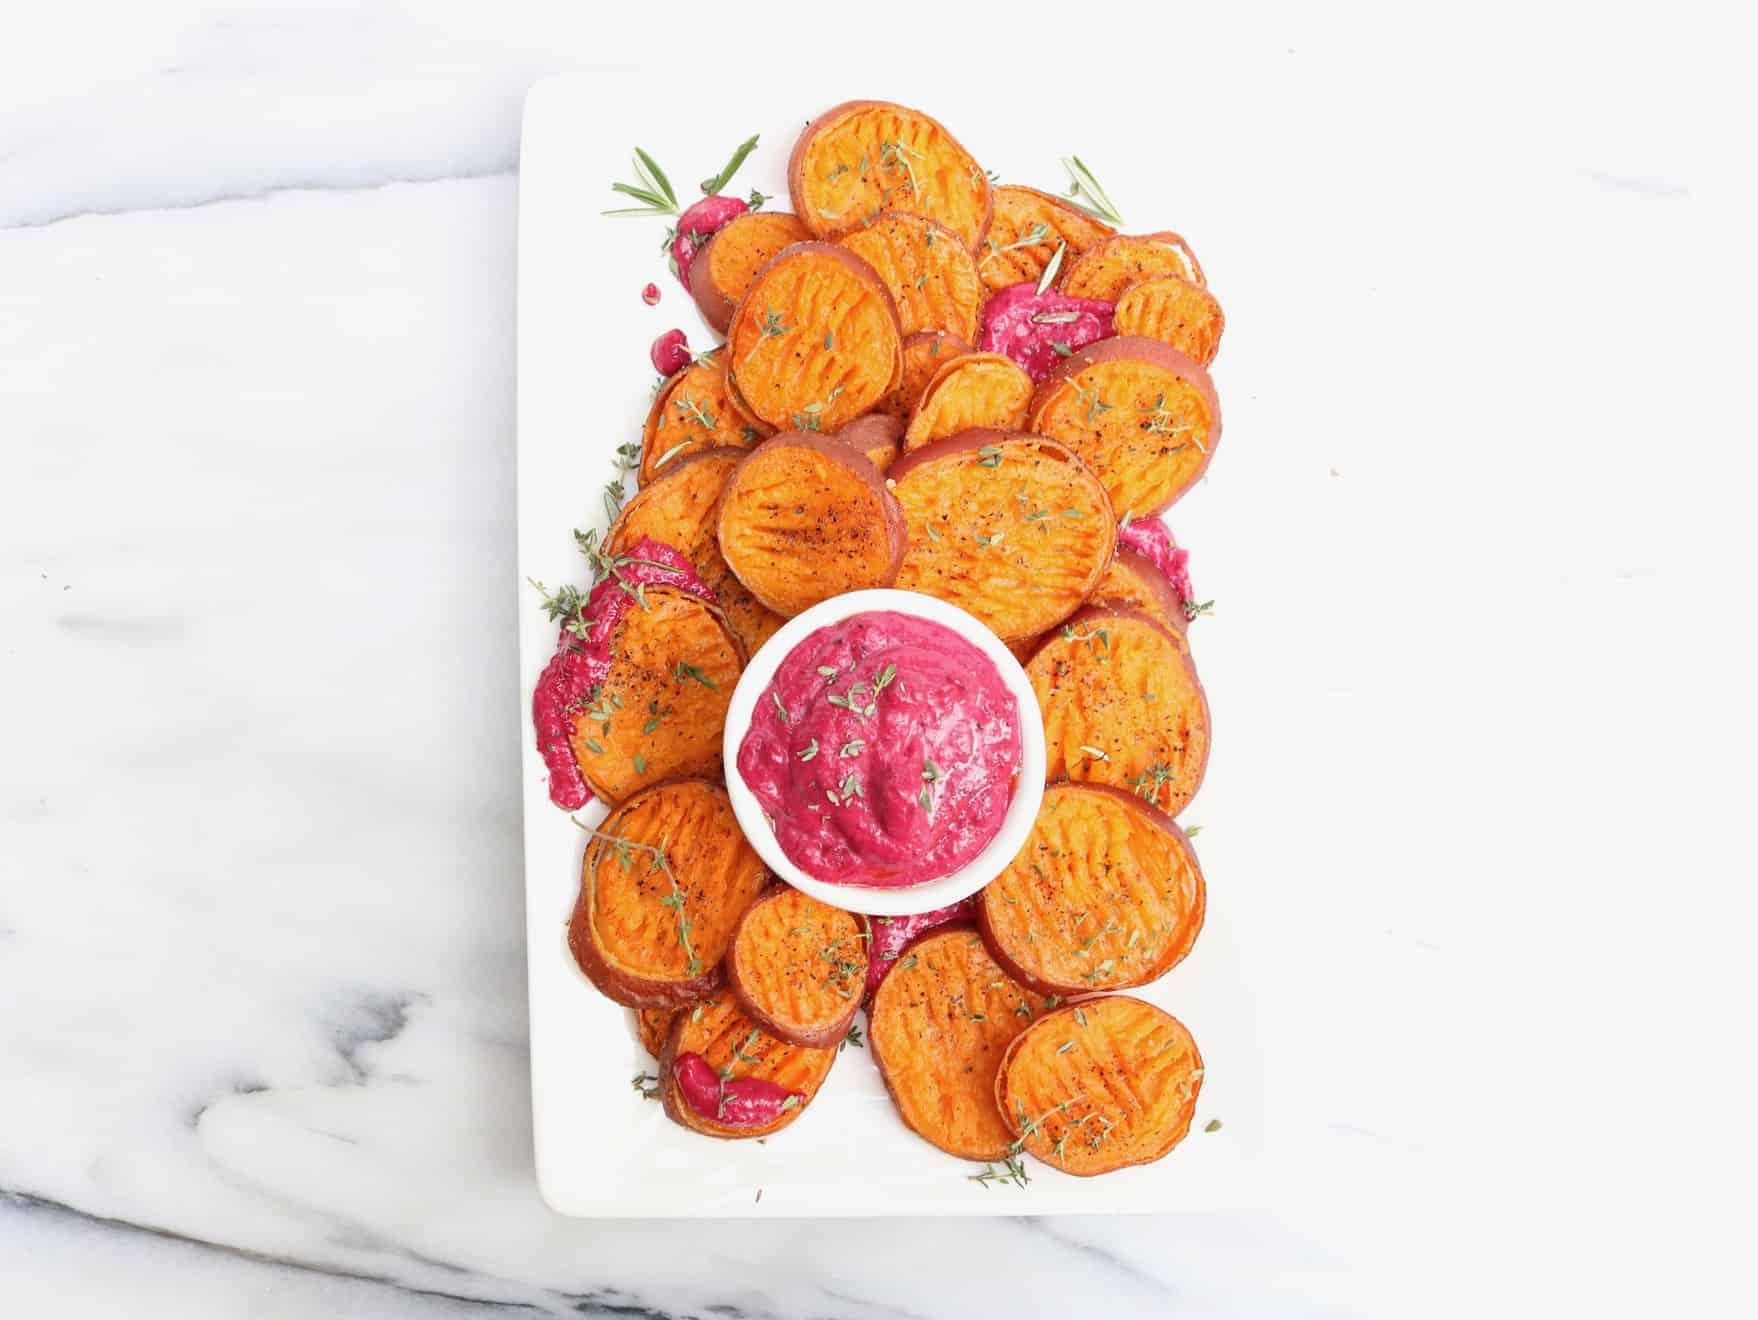 Smashed Sweet Potatoes with Beet Garlic Aioli